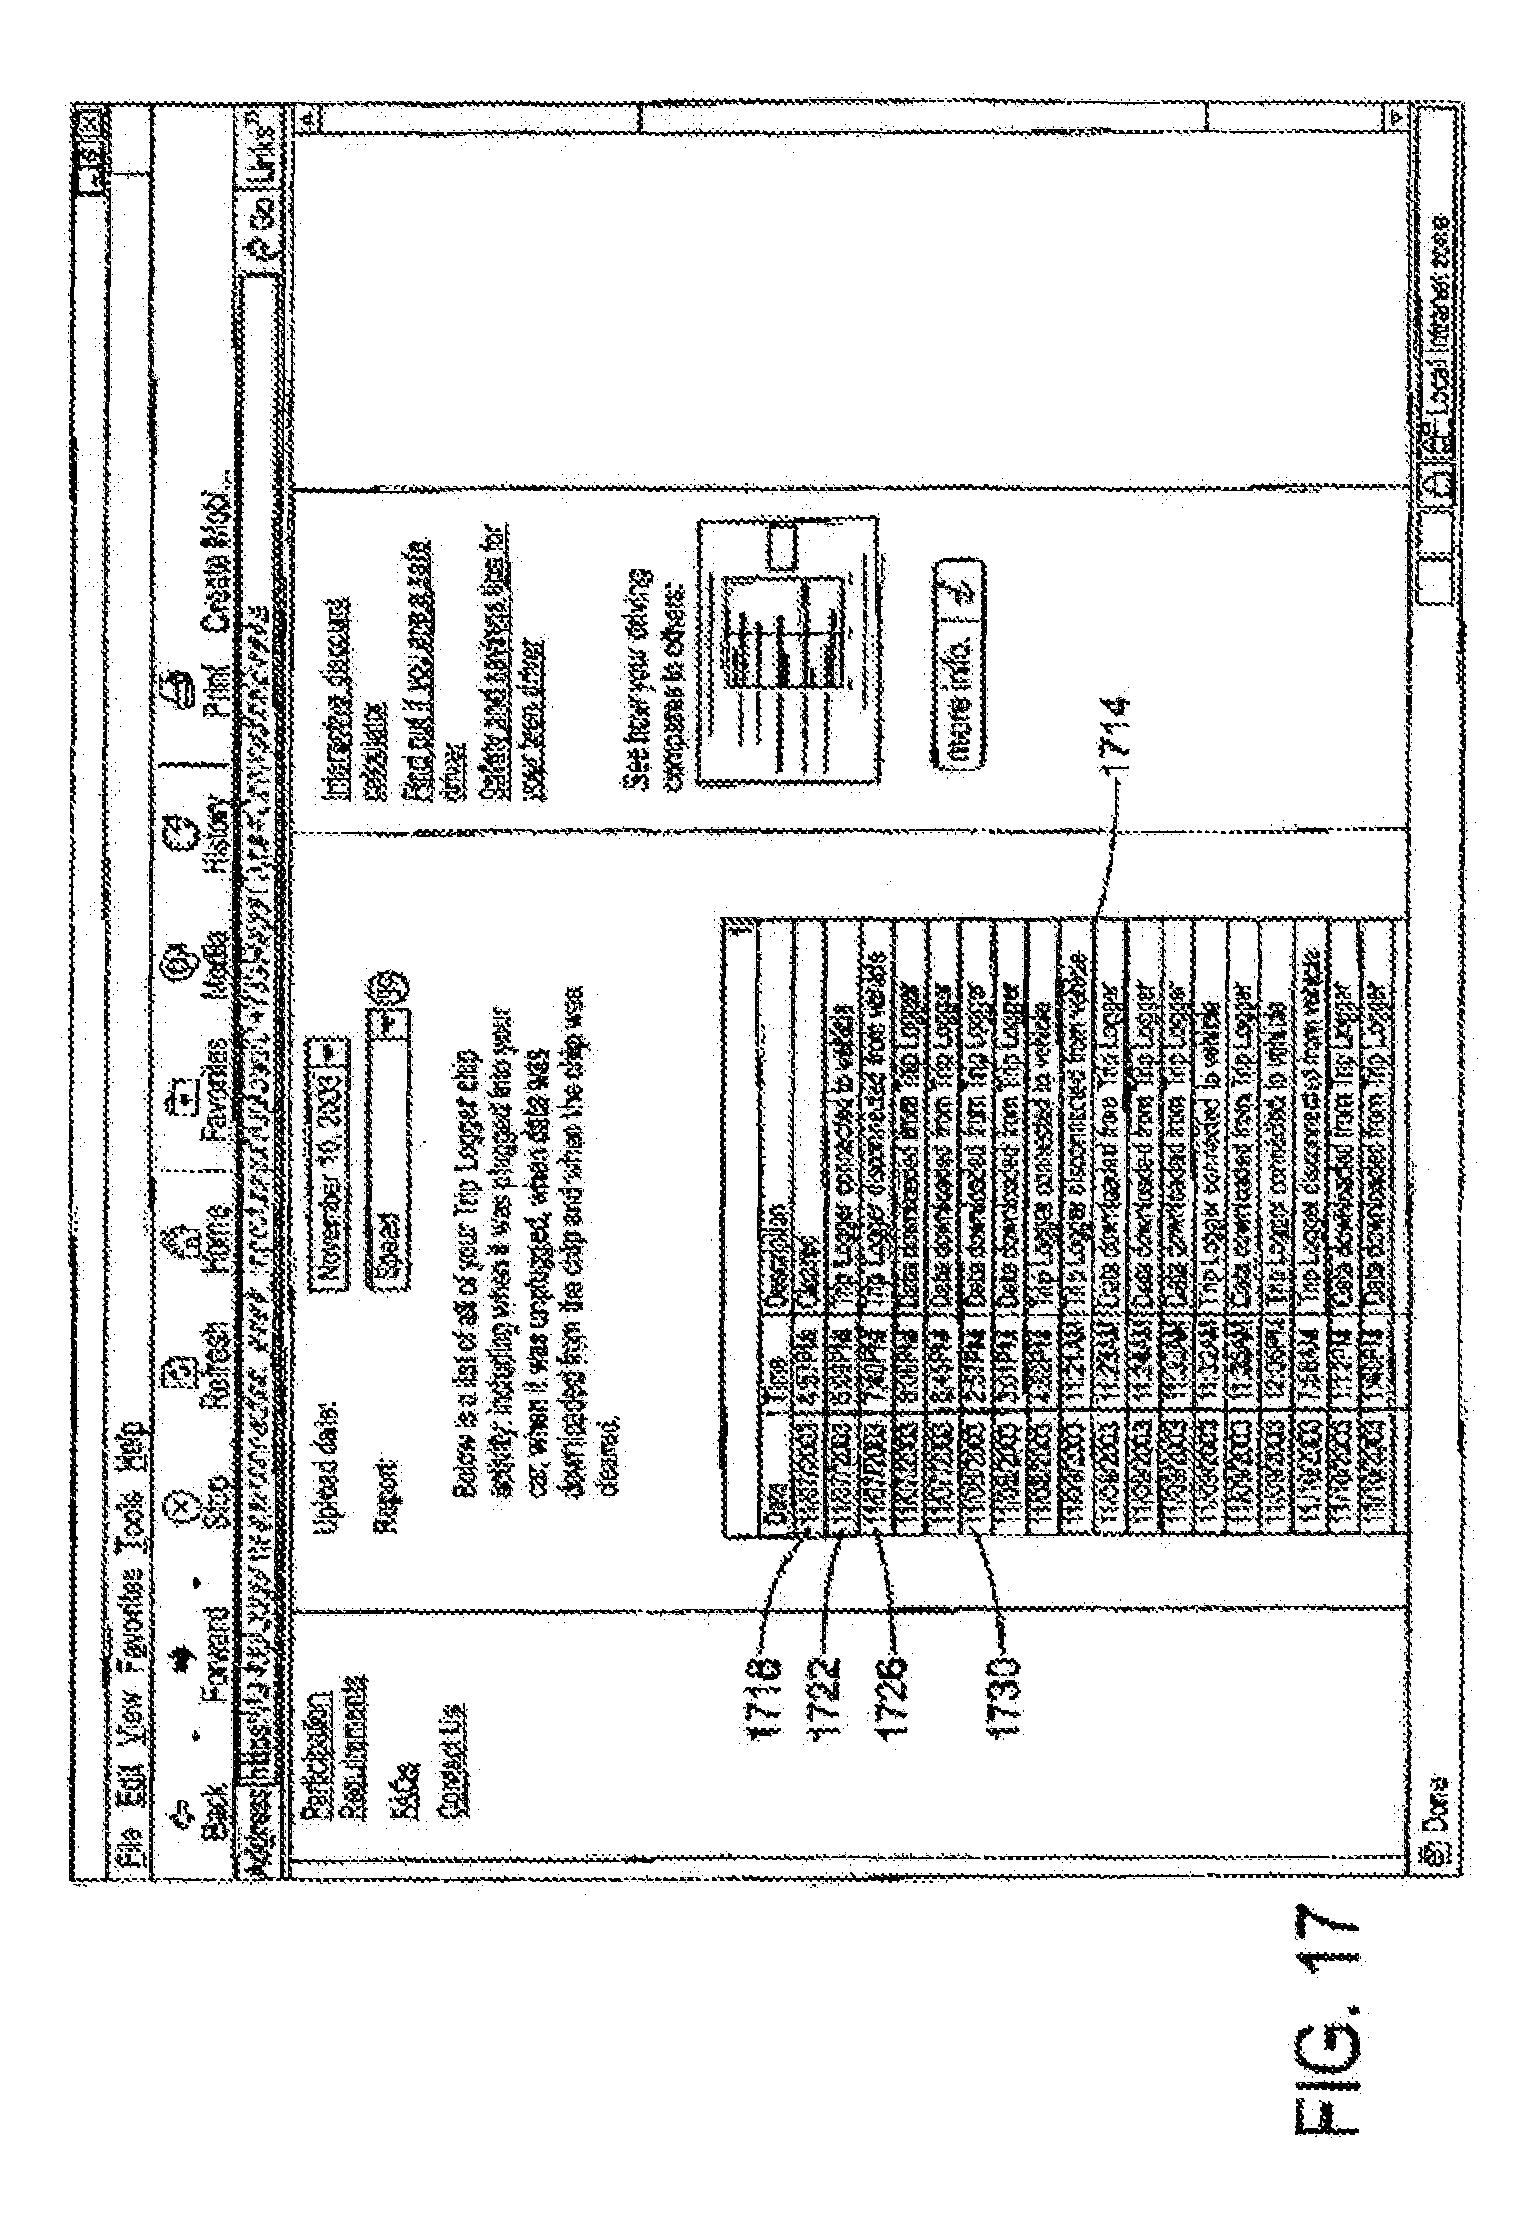 Patent Us 8892451 B2 Wiring Schematics For An Au Quotpremium Sound Systemquot Australian Ford Images